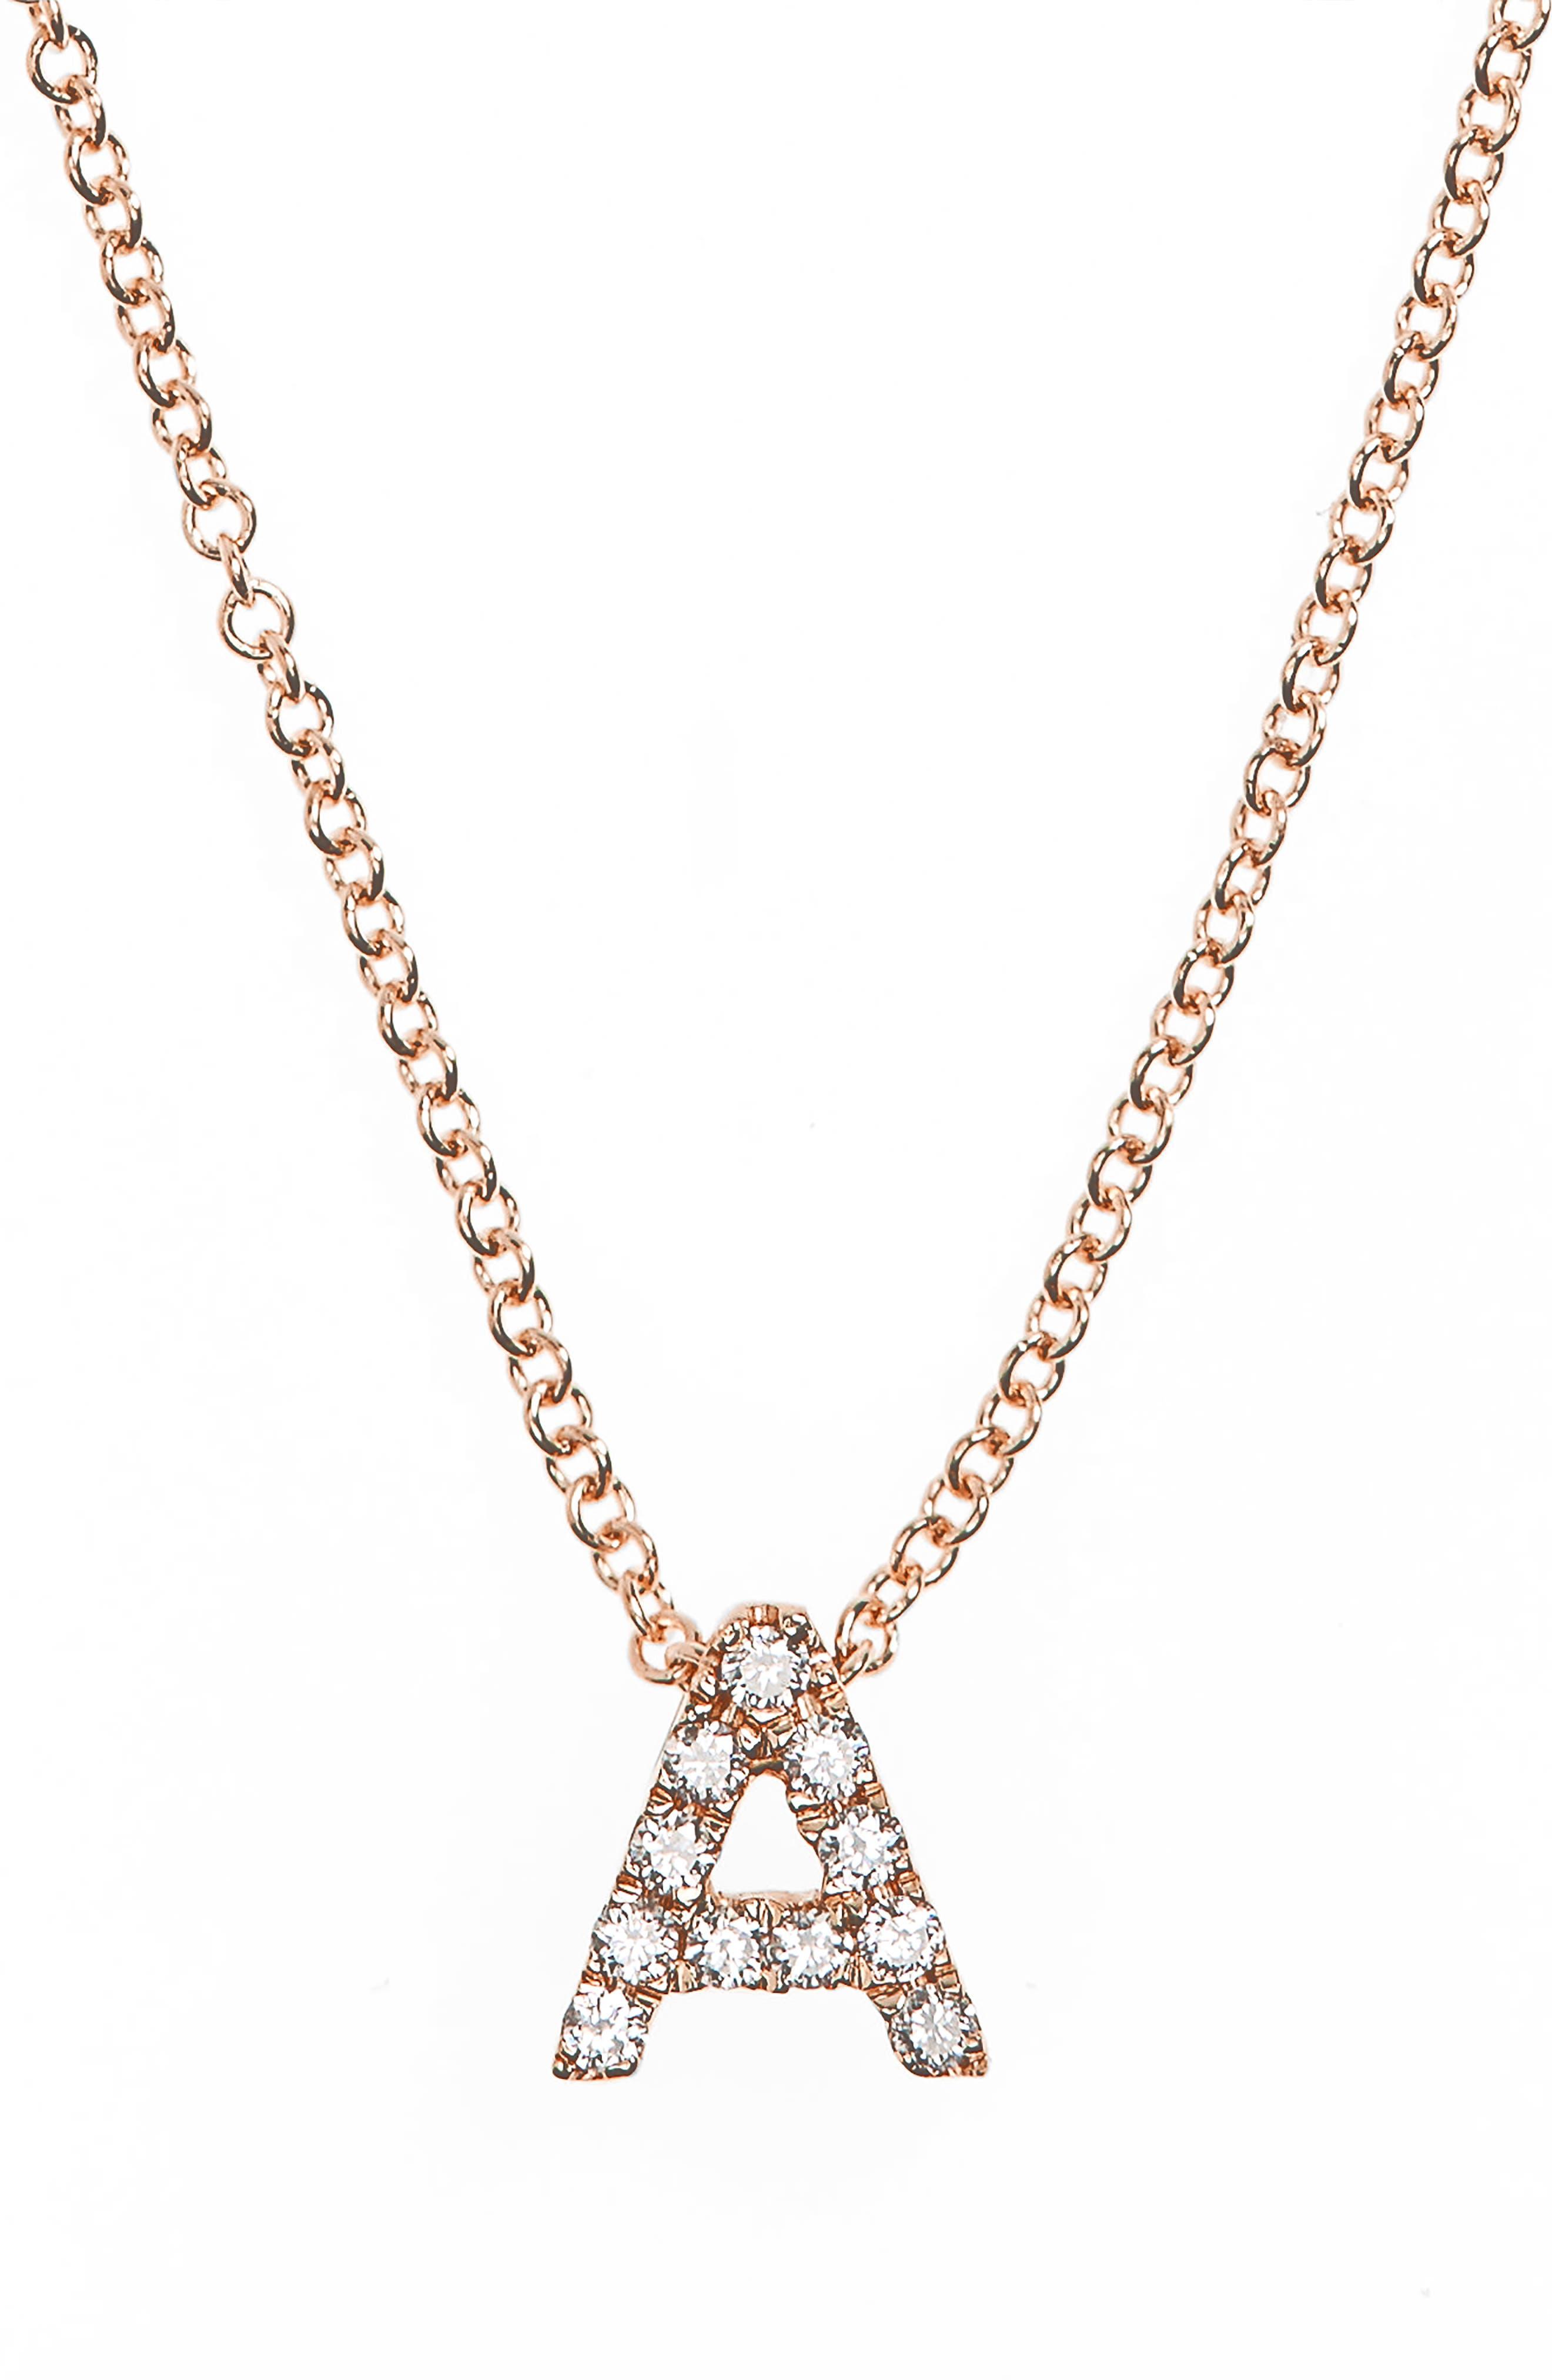 18k Gold Pavé Diamond Initial Pendant Necklace,                             Alternate thumbnail 2, color,                             ROSE GOLD - A